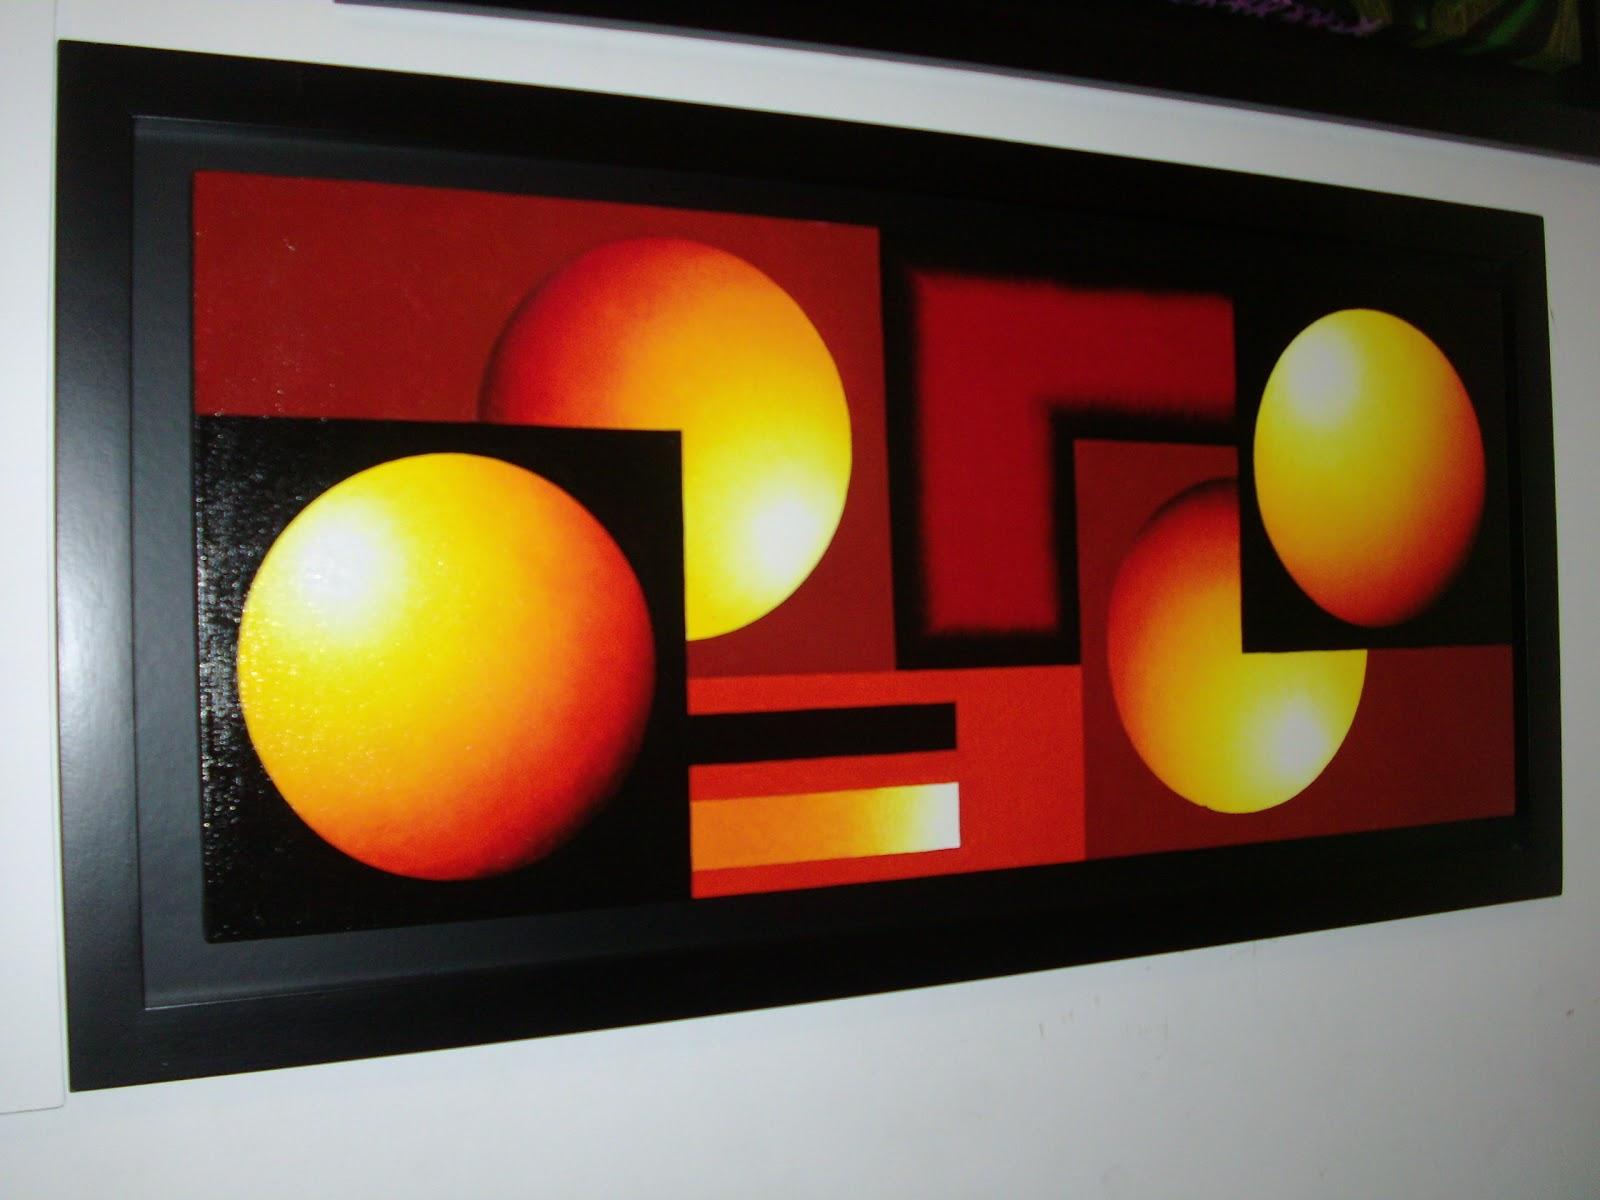 Arte y galer a mu oz 03 sep 2011 for Imagenes de cuadros abstractos geometricos